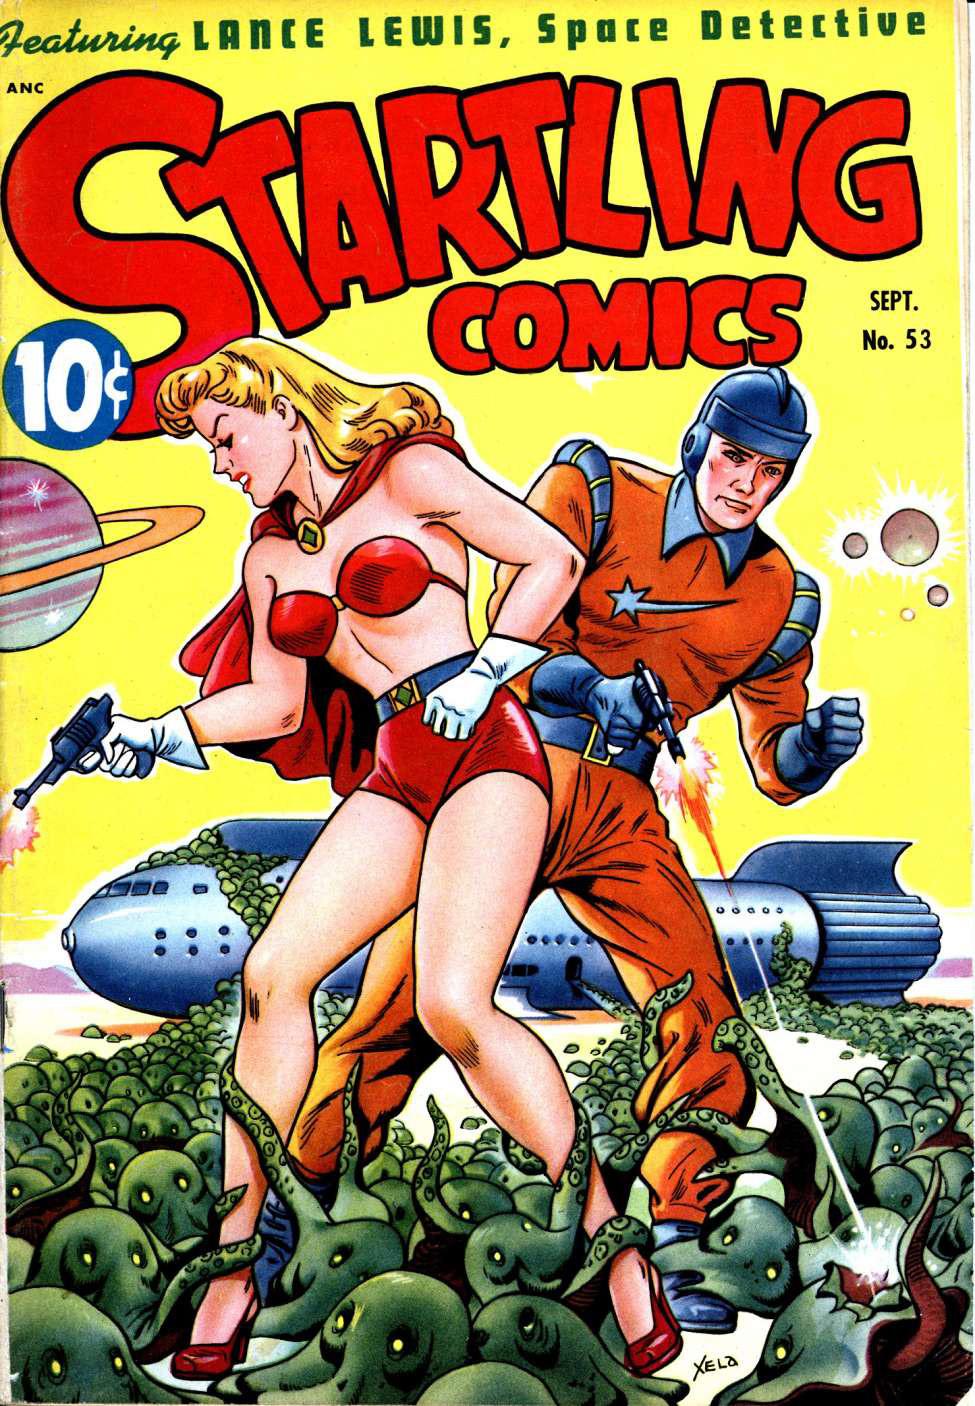 Startling Comics #53, Pines